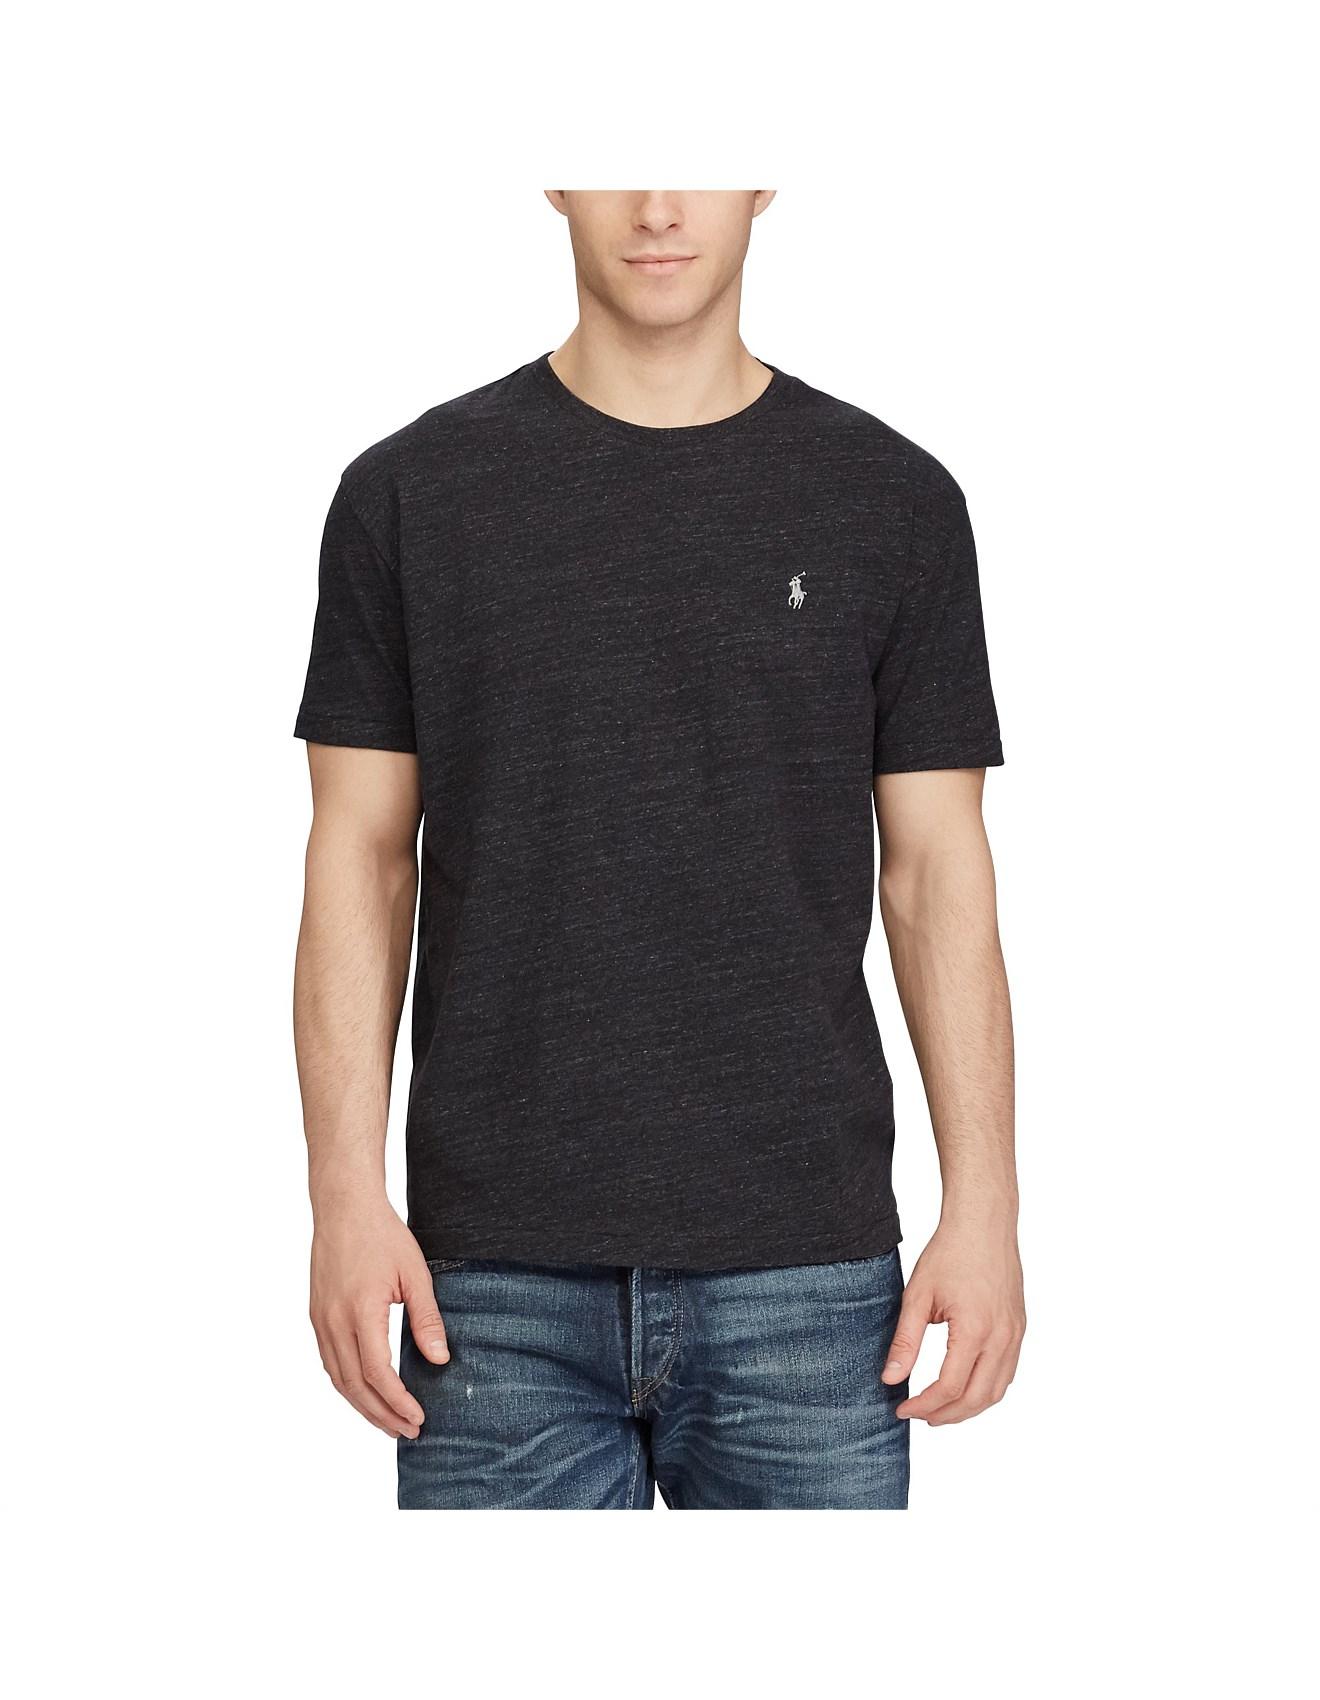 86553eac0e9916 Mens Custom Slim Fit Cotton T-Shirt. 1; 2; 3. Zoom. Polo Ralph Lauren